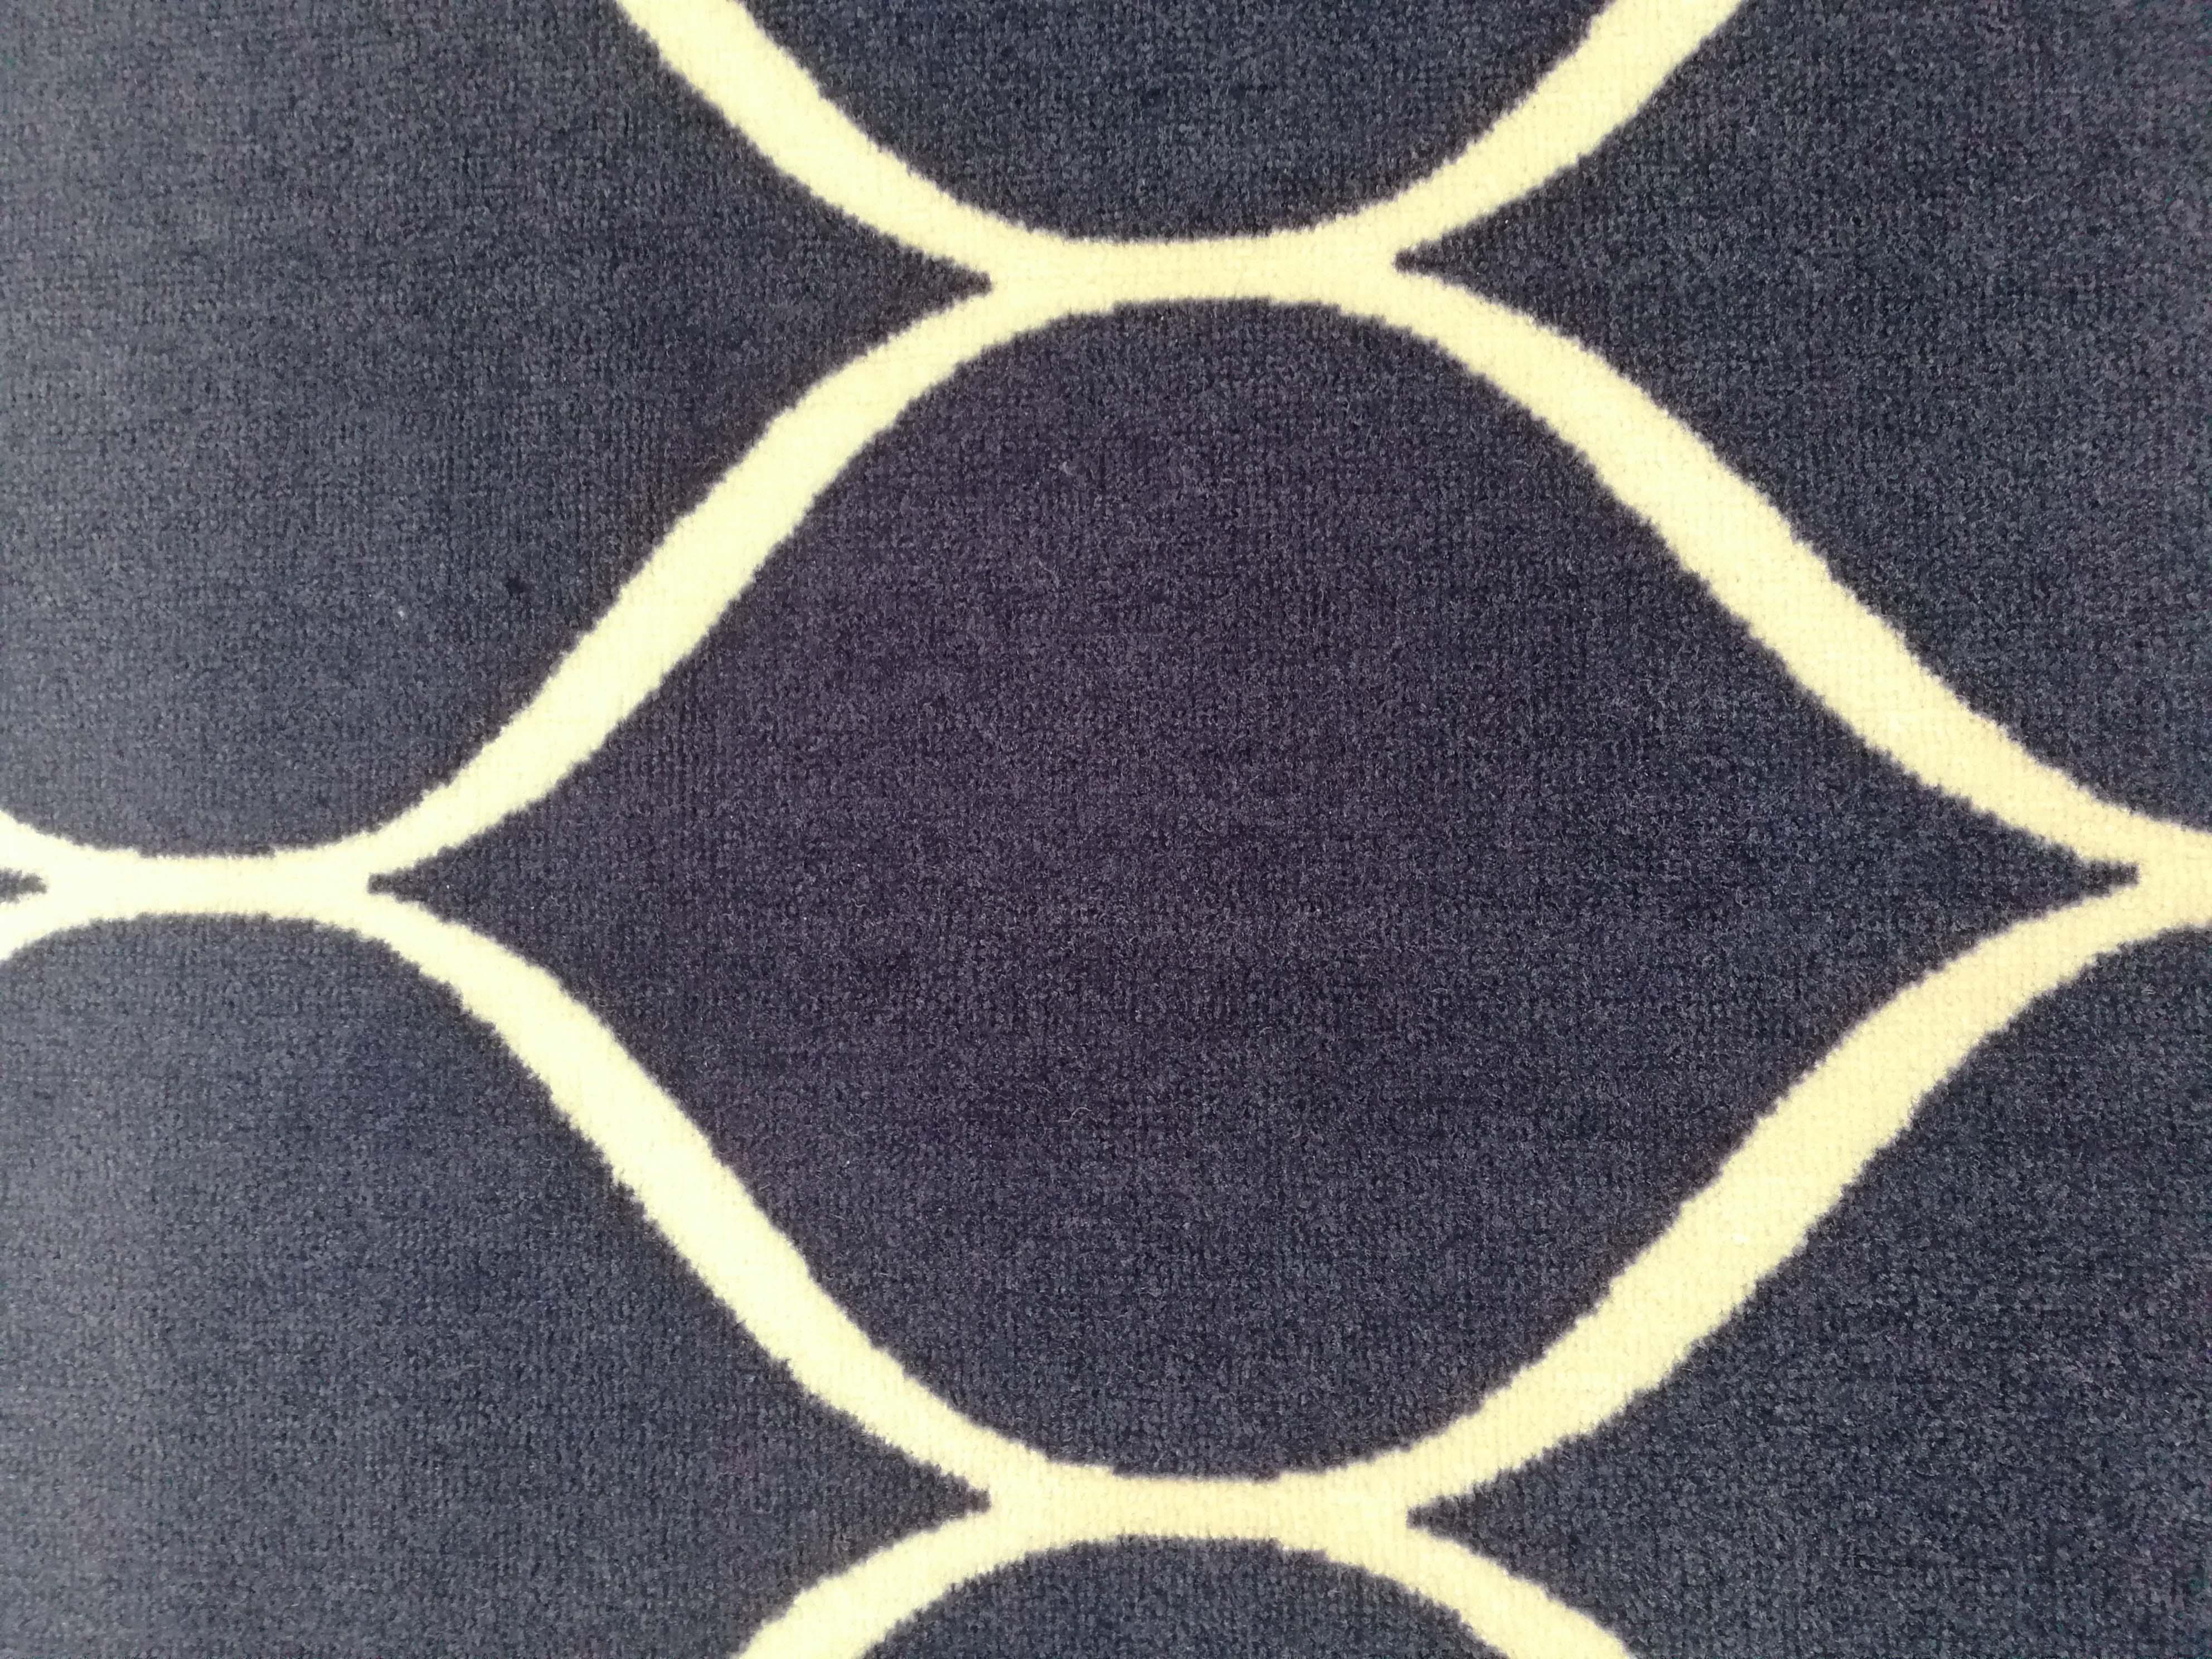 Design moderno Poli Impresso Poliéster Antiderrapante Tapete Tapete de Área Tapete Casa Sala de estar Impresso